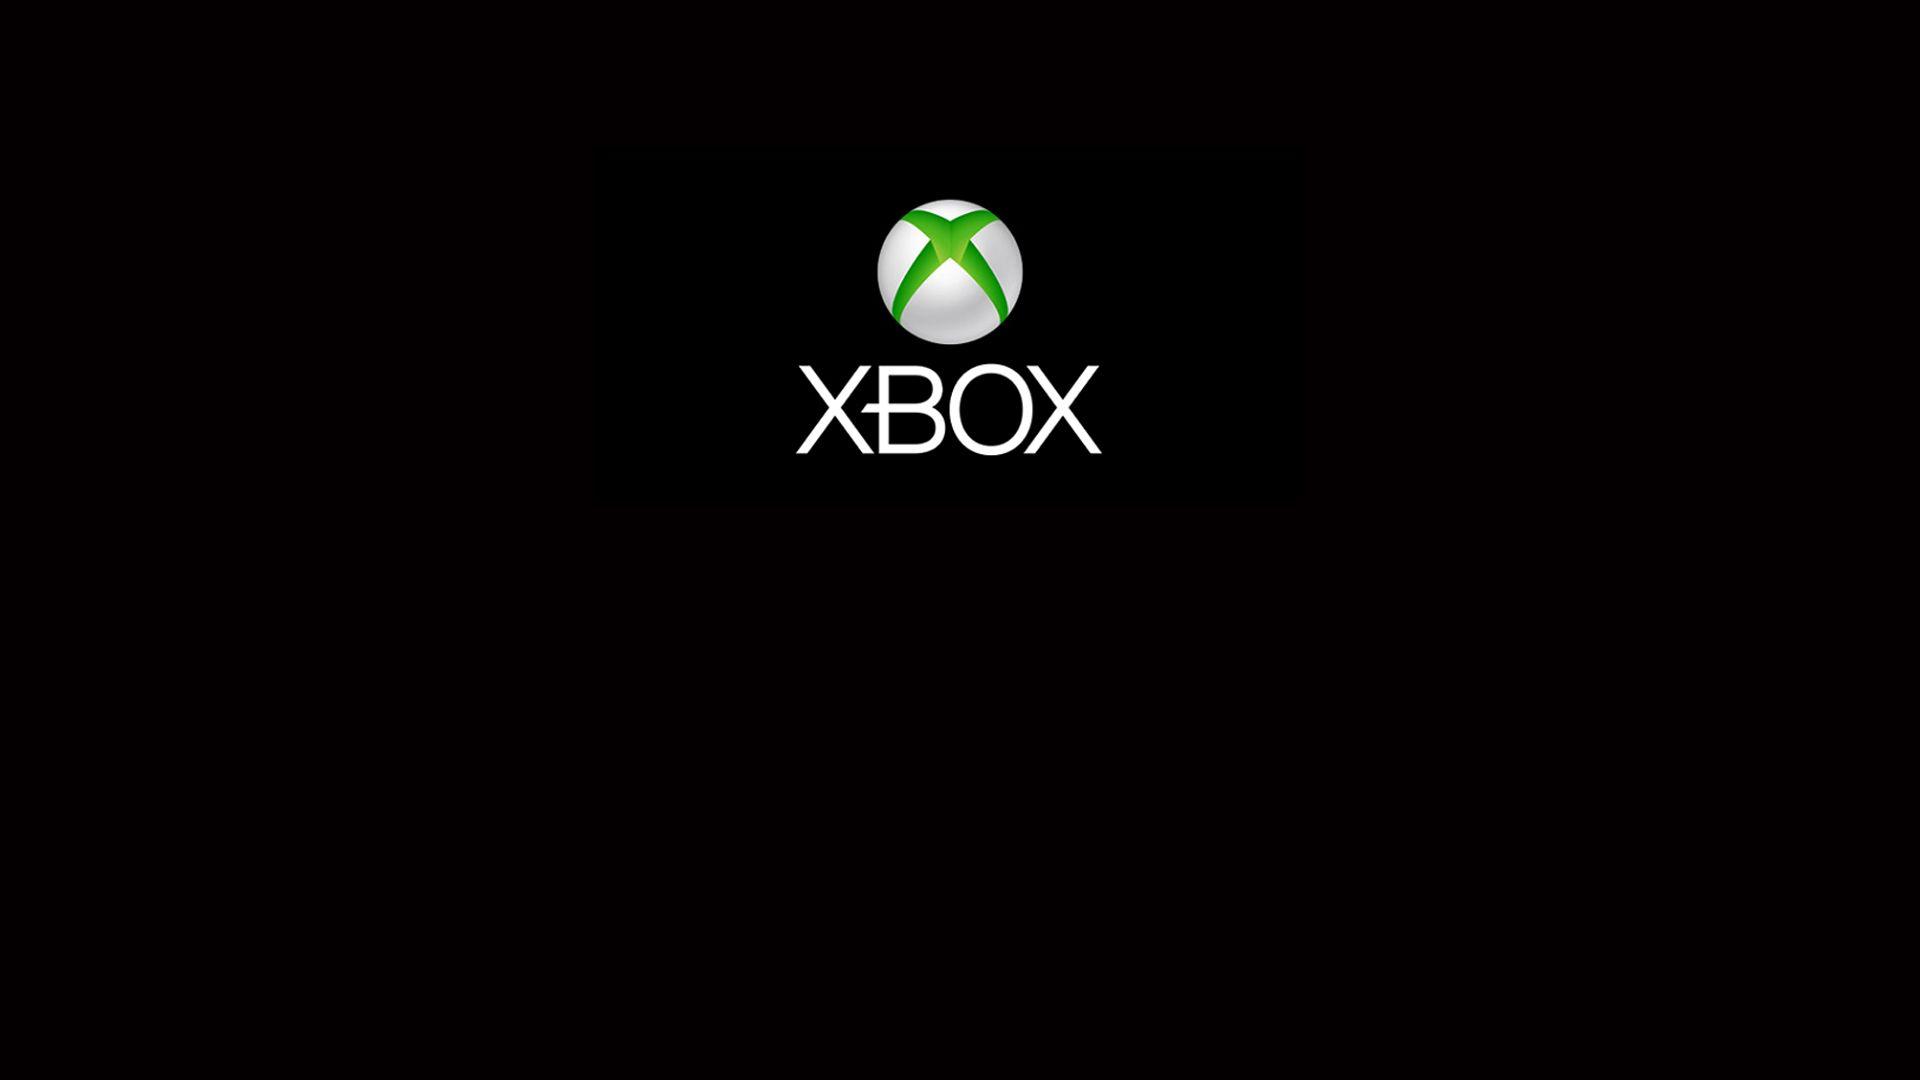 Xbox Logo Wallpapers 1920x1080